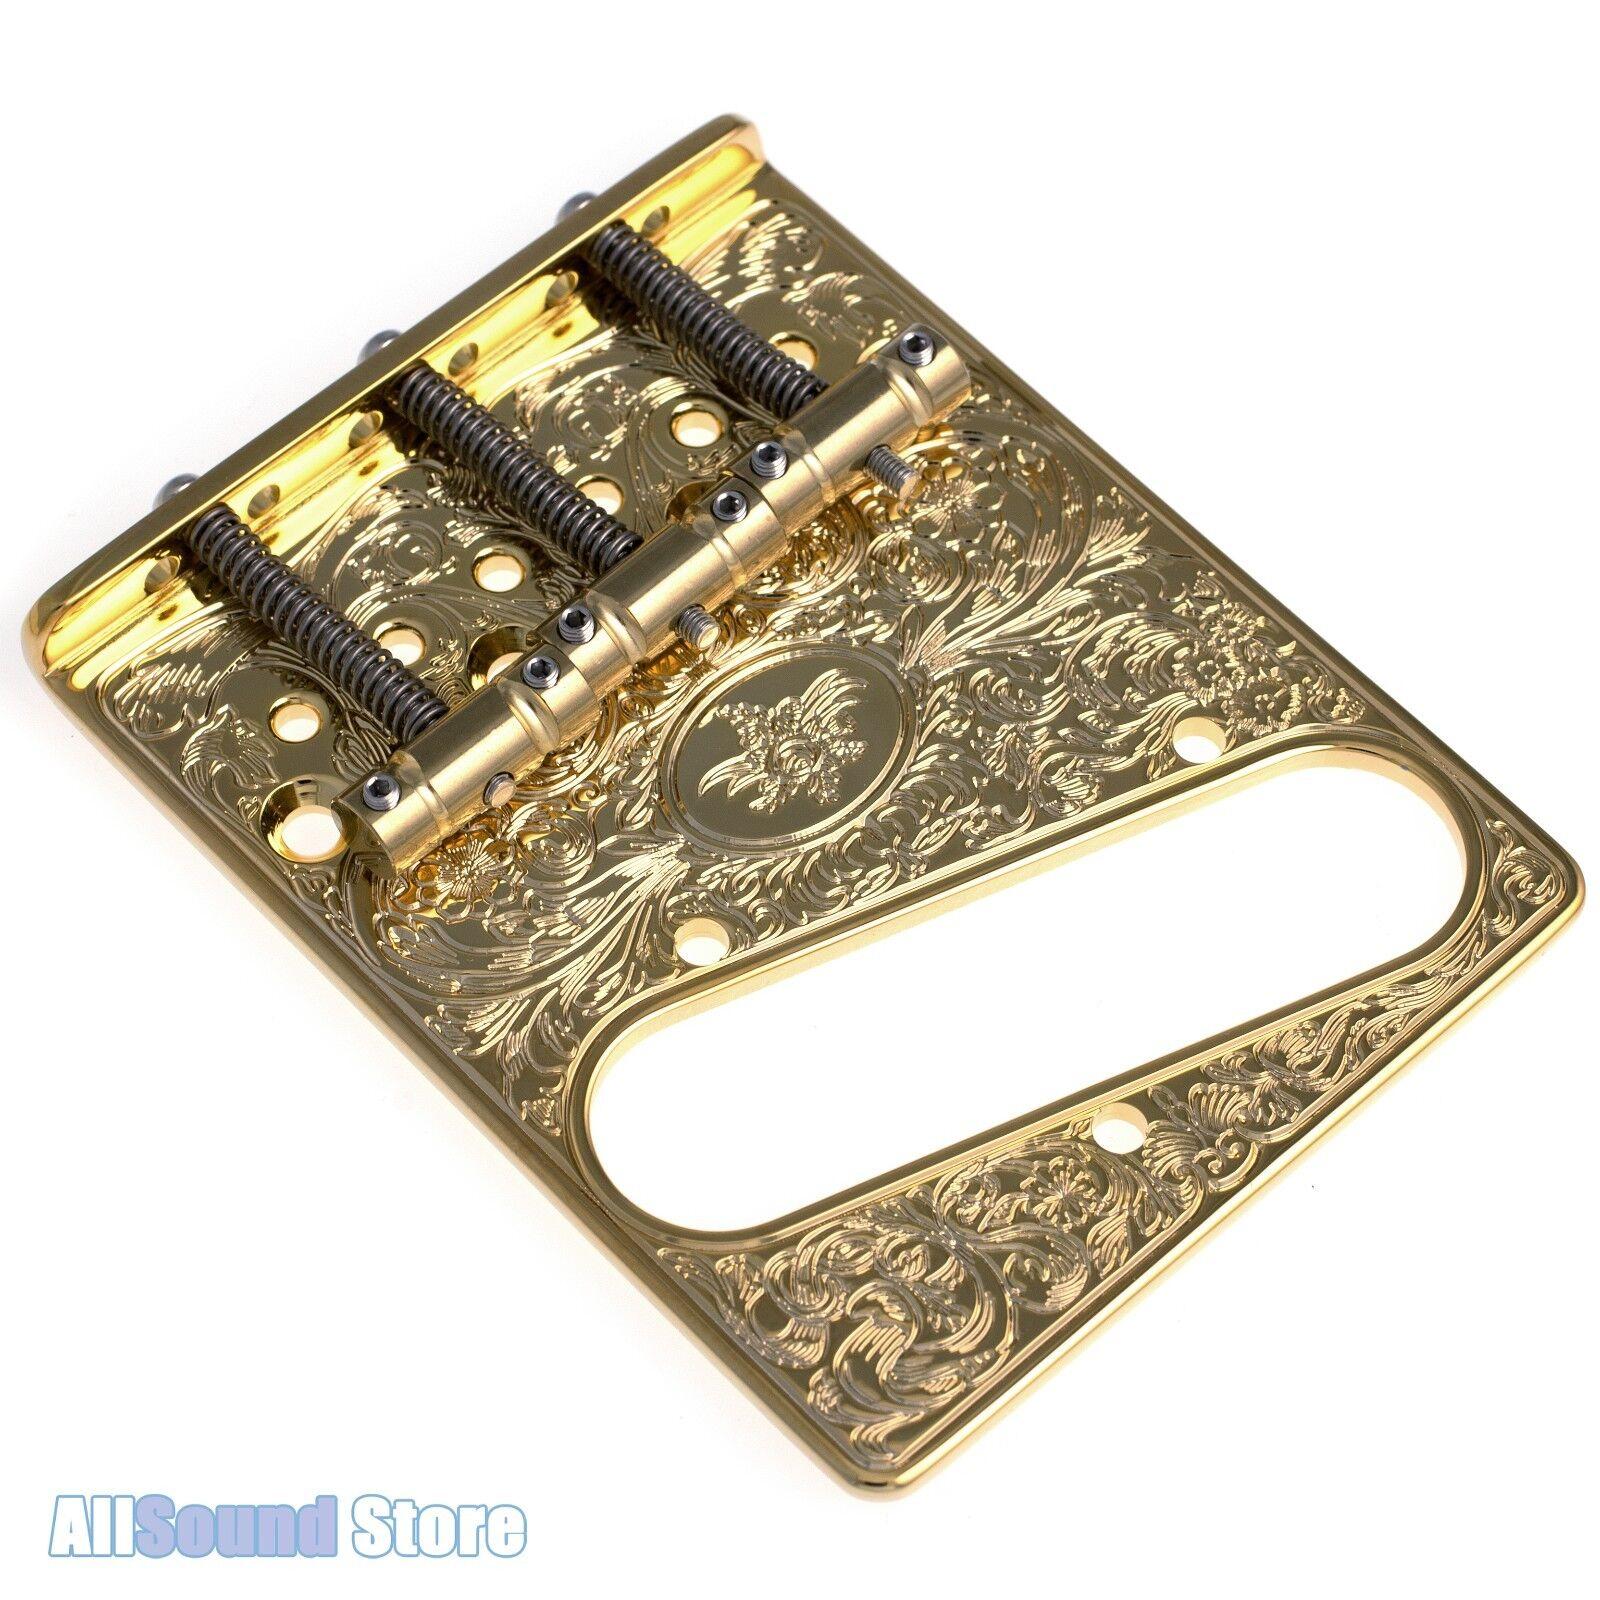 Gotoh GTC-ART-03  Acanthus  In-Tune Engraved Bridge for Telecaster Tele - Gold